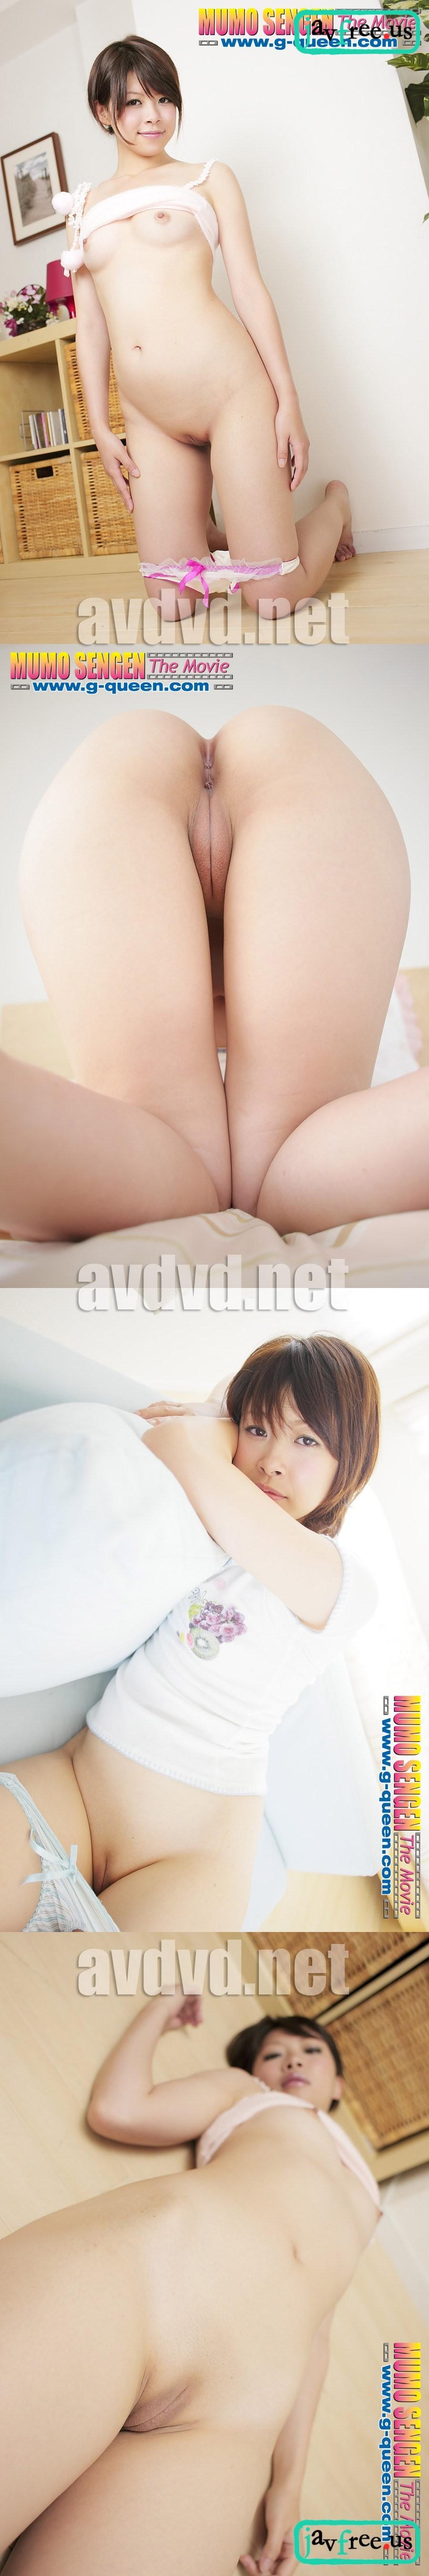 G-Queen 無毛宣言 Vol. 284 : Mascarade - 武内麻友(Mayu Takeuchi) - image G-queen-MayuTakeuchi-Mascarade on https://javfree.me